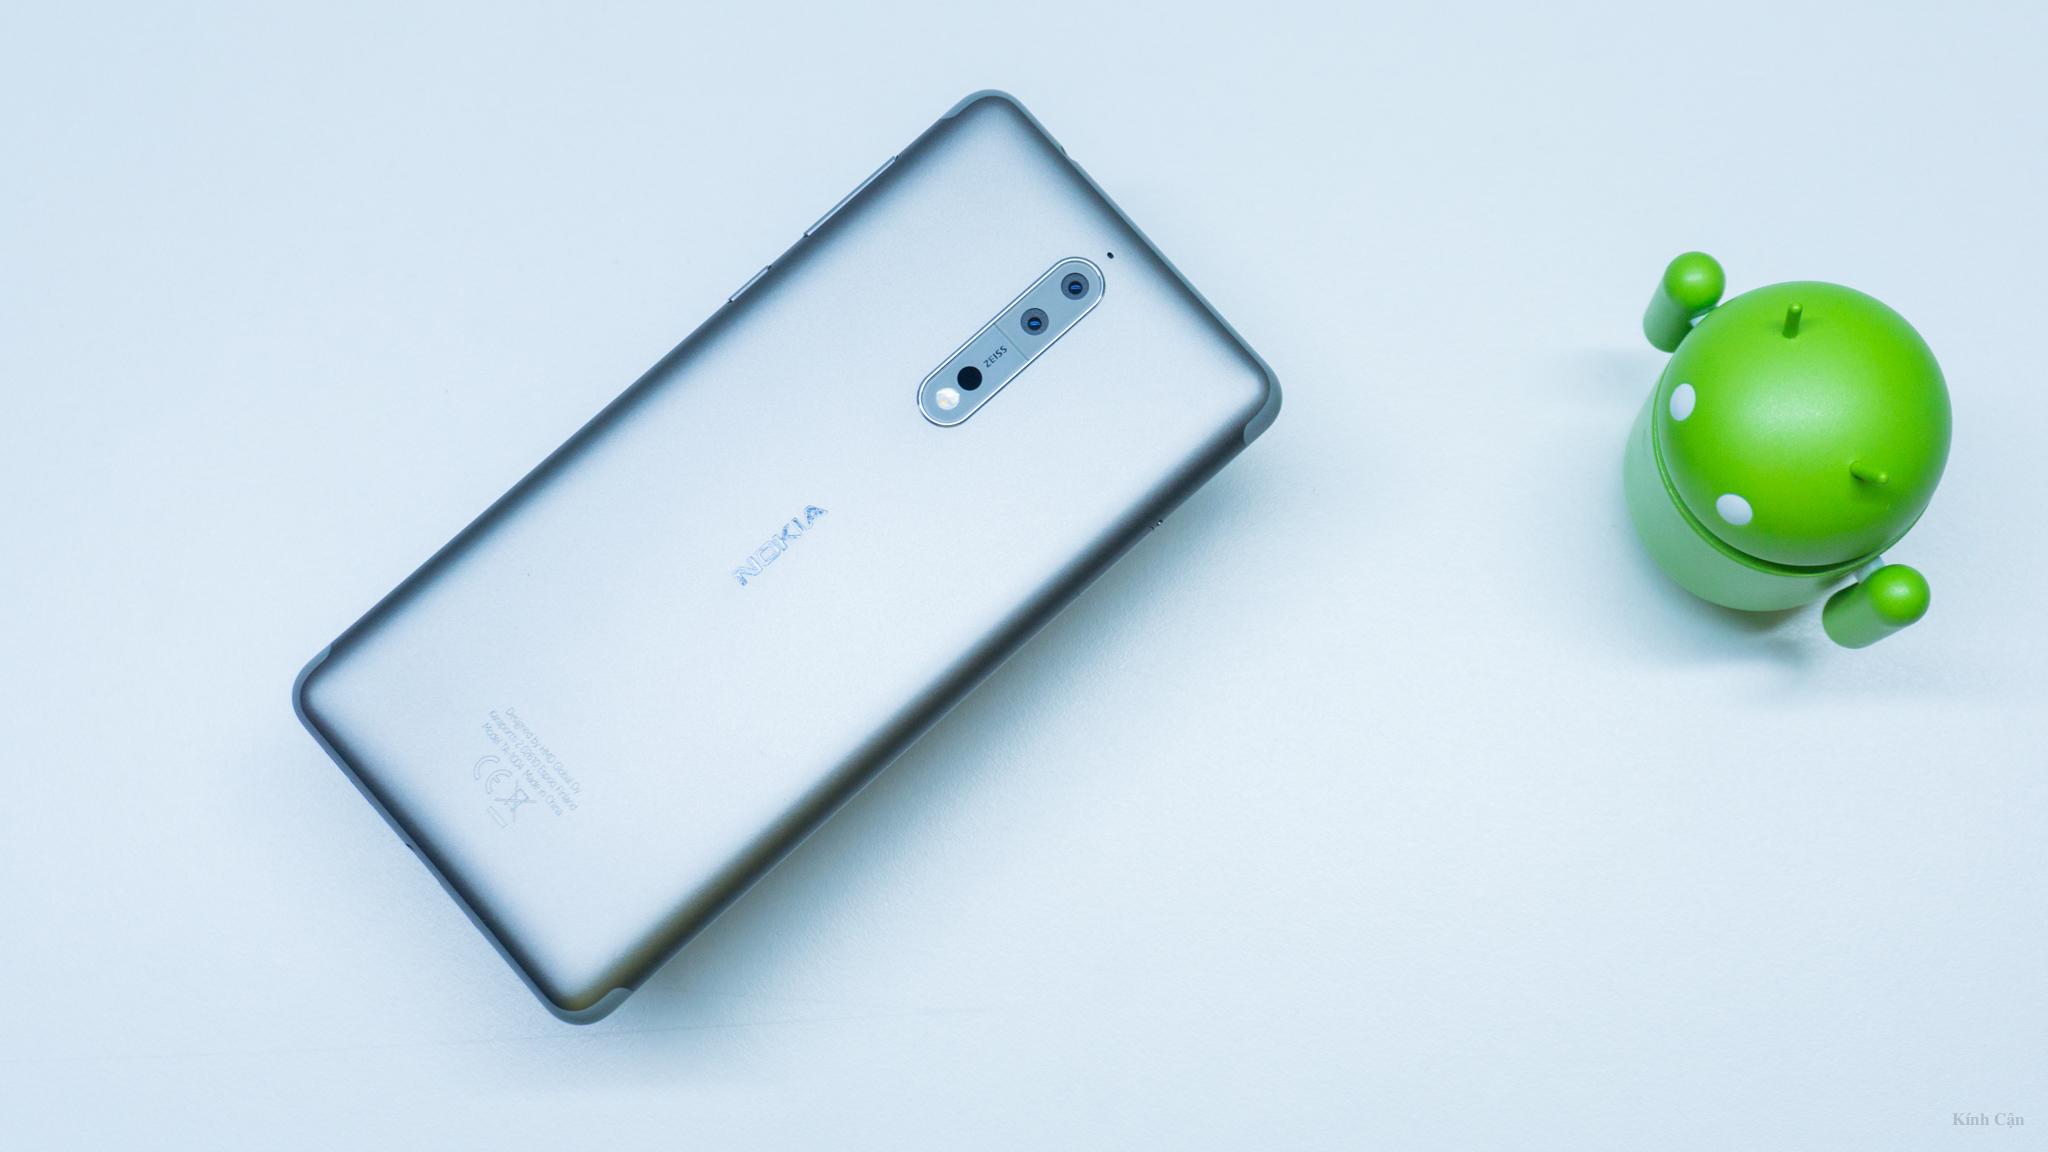 Nokia 8 cập nhật Android 9 Pie-3.jpg